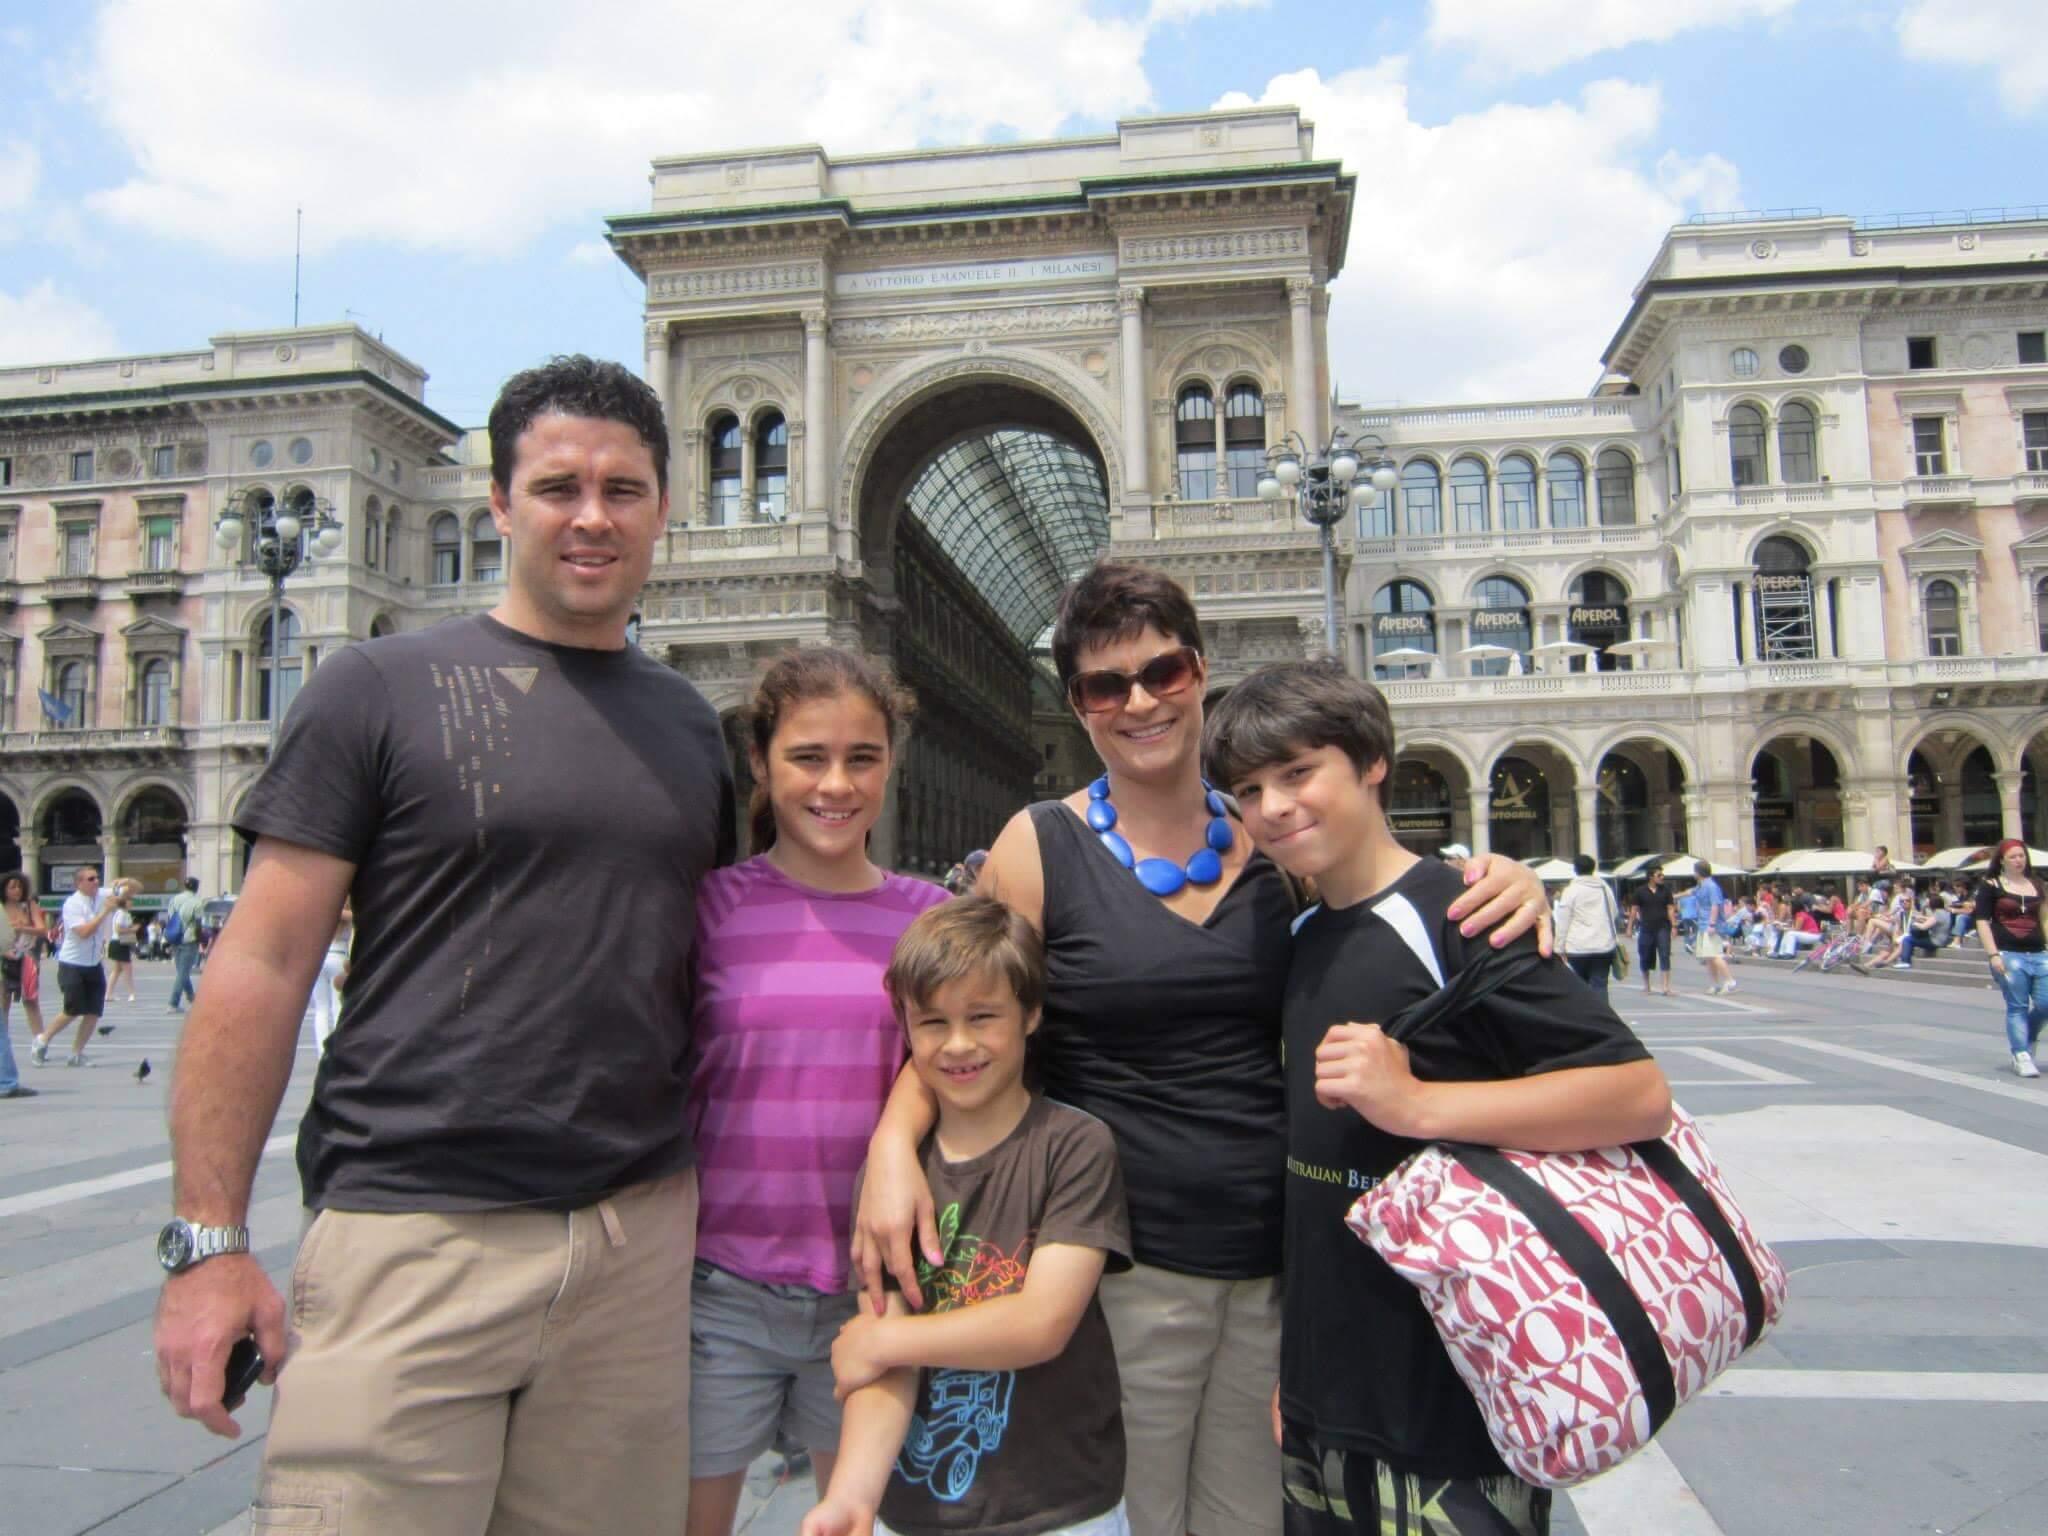 Duomo Milano northern Italy